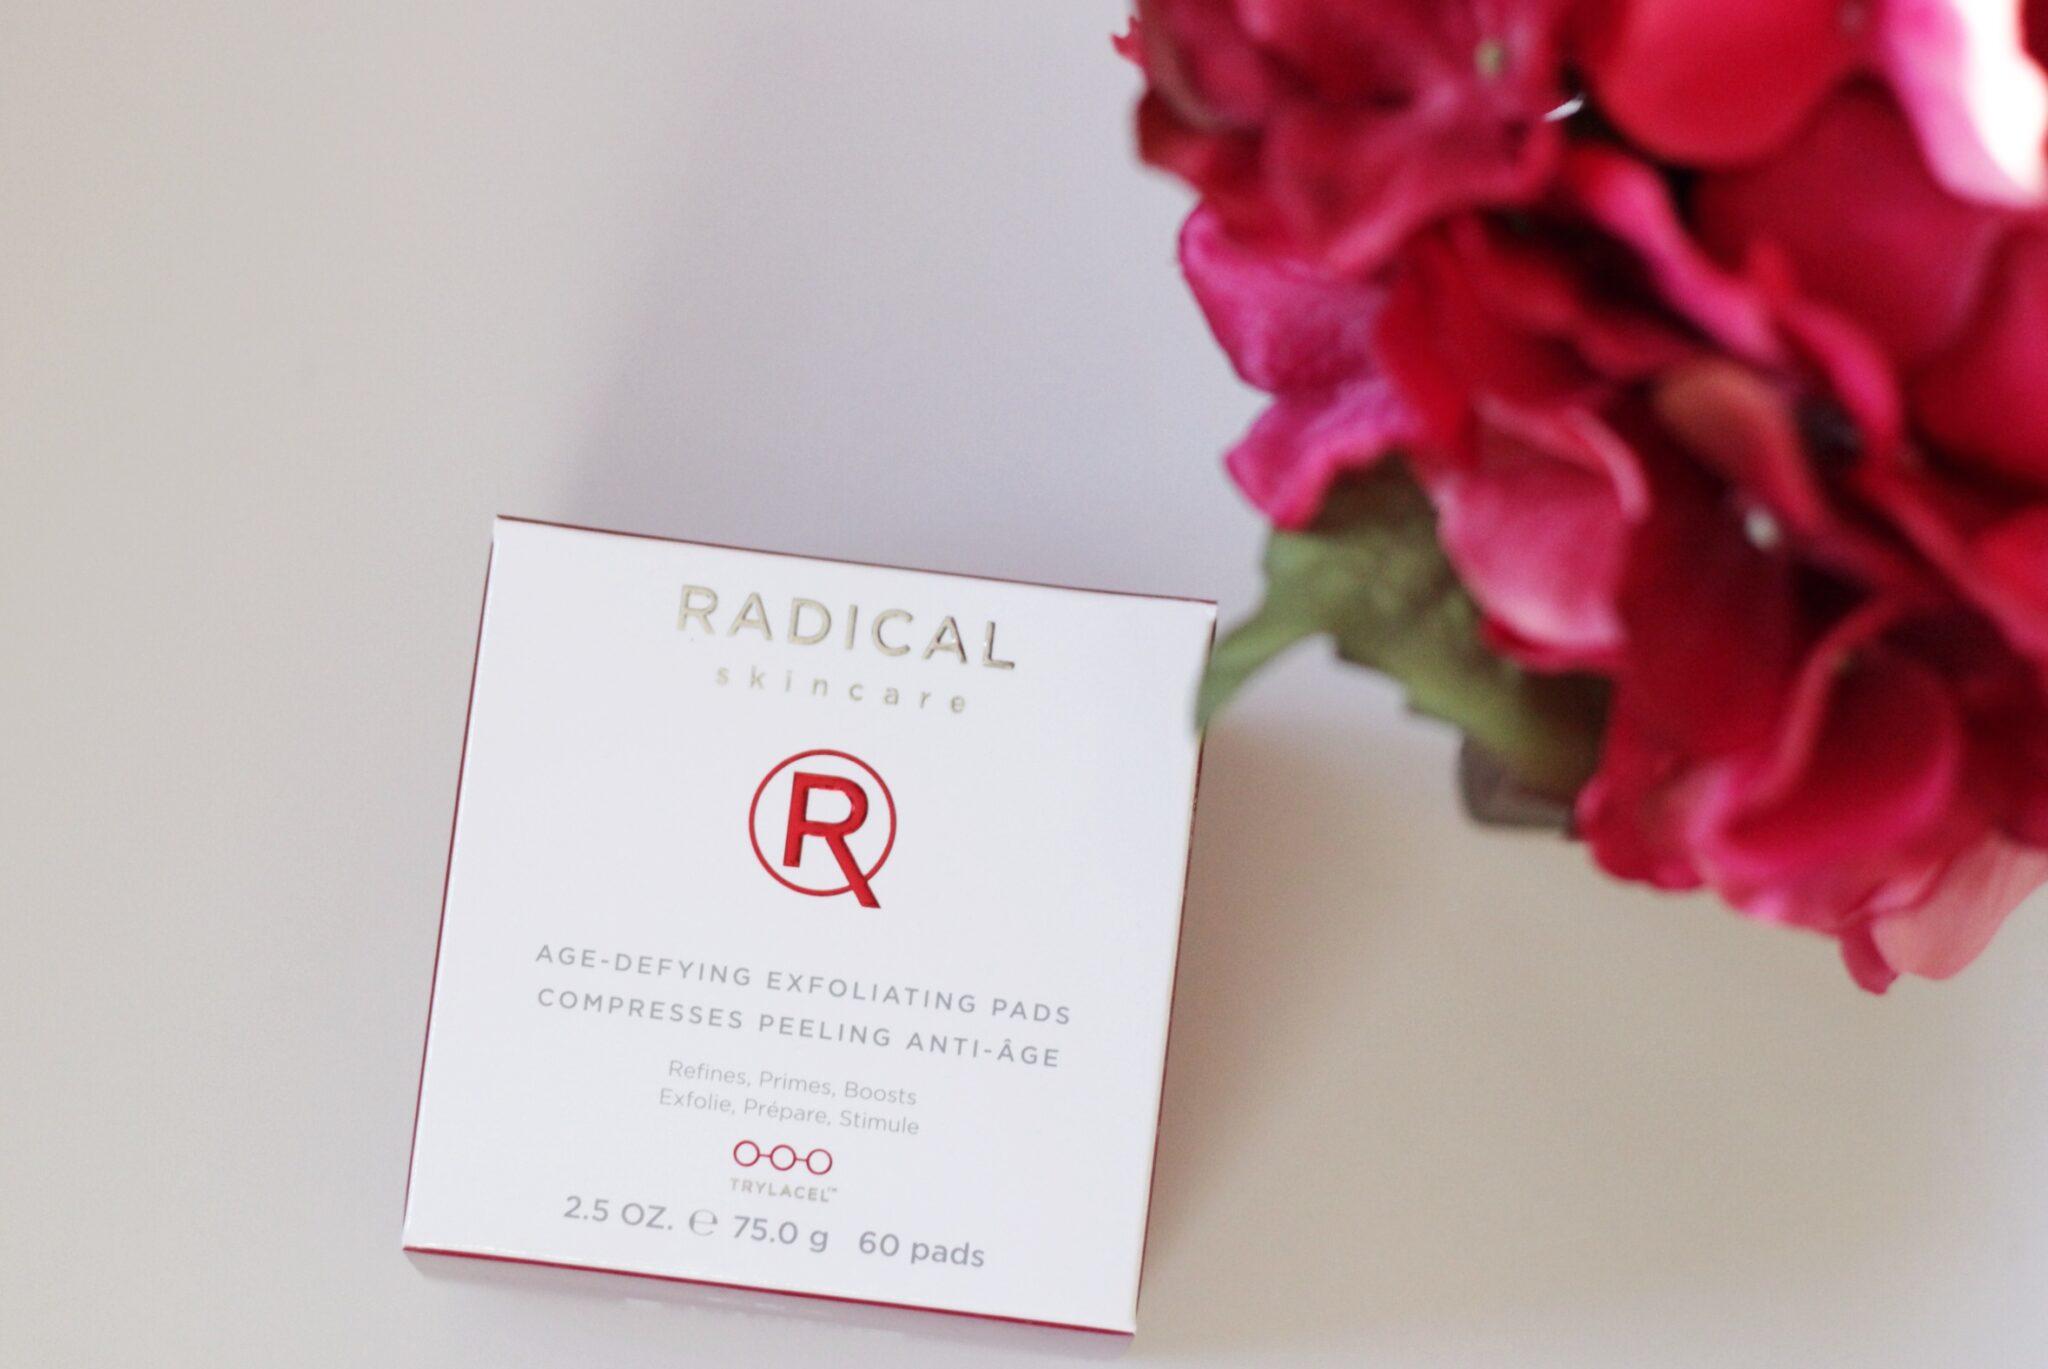 Radical-skincare-makeuplifelove- exfoliating